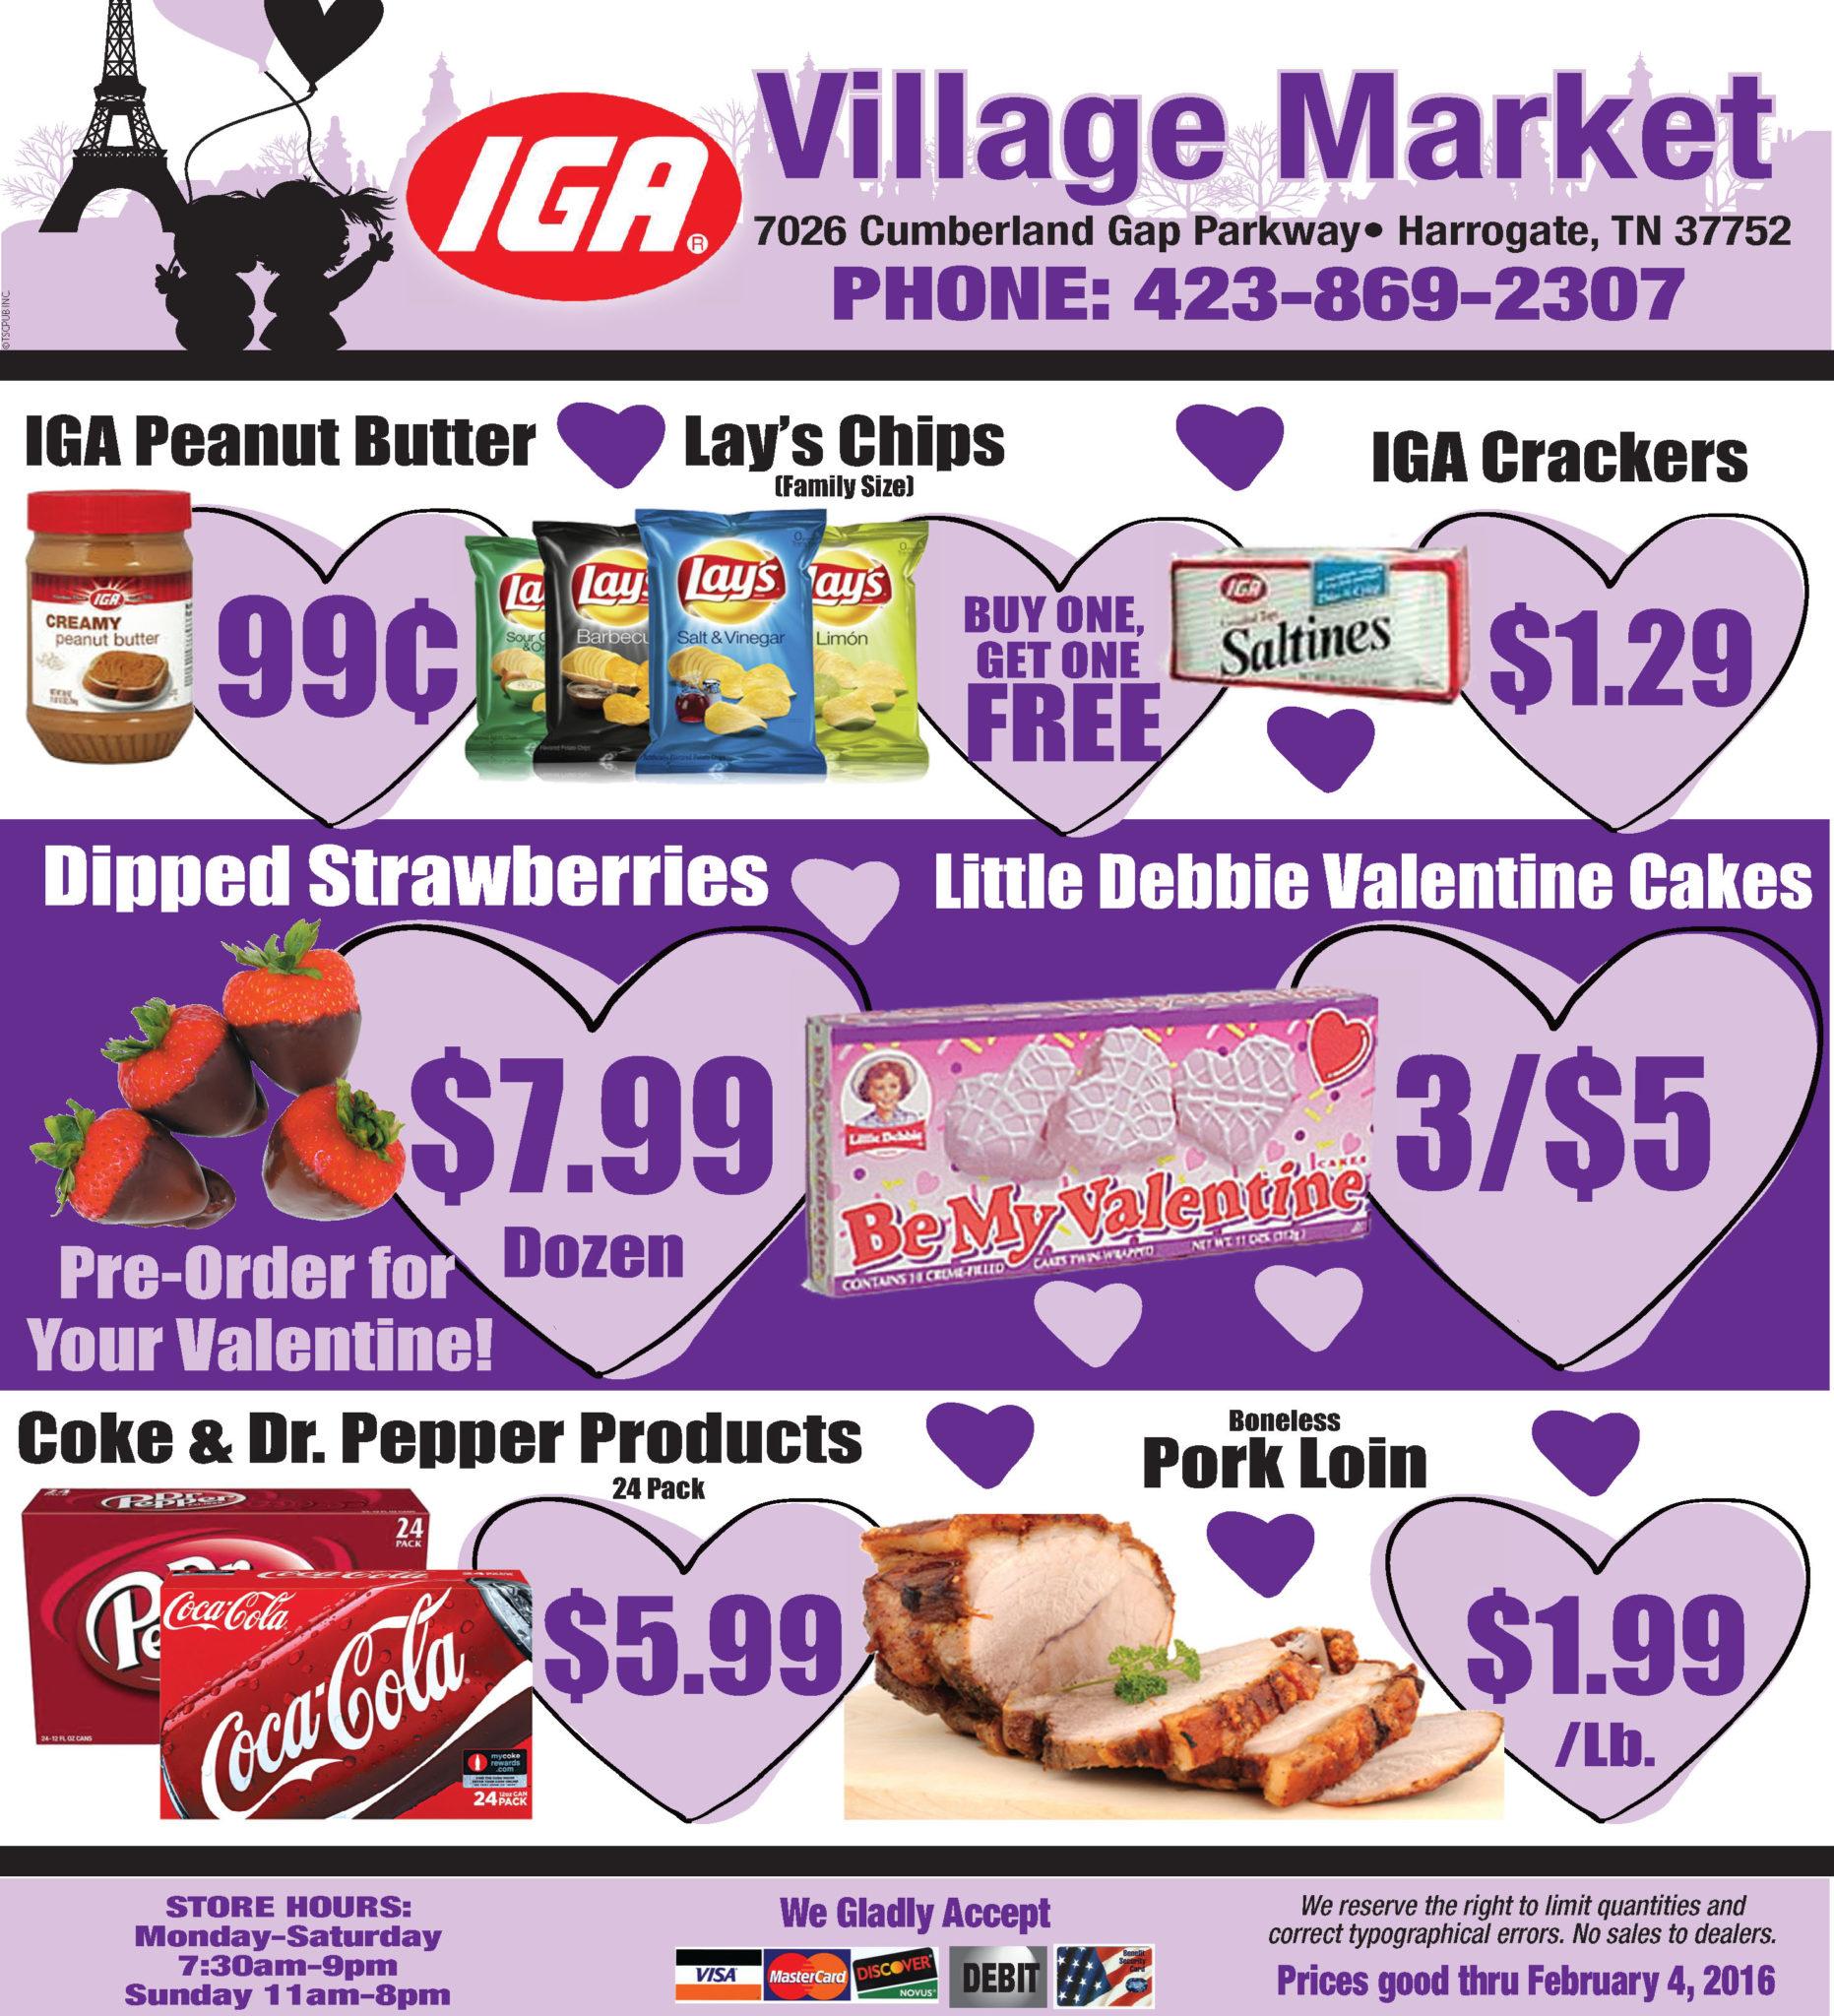 Village Market IGA